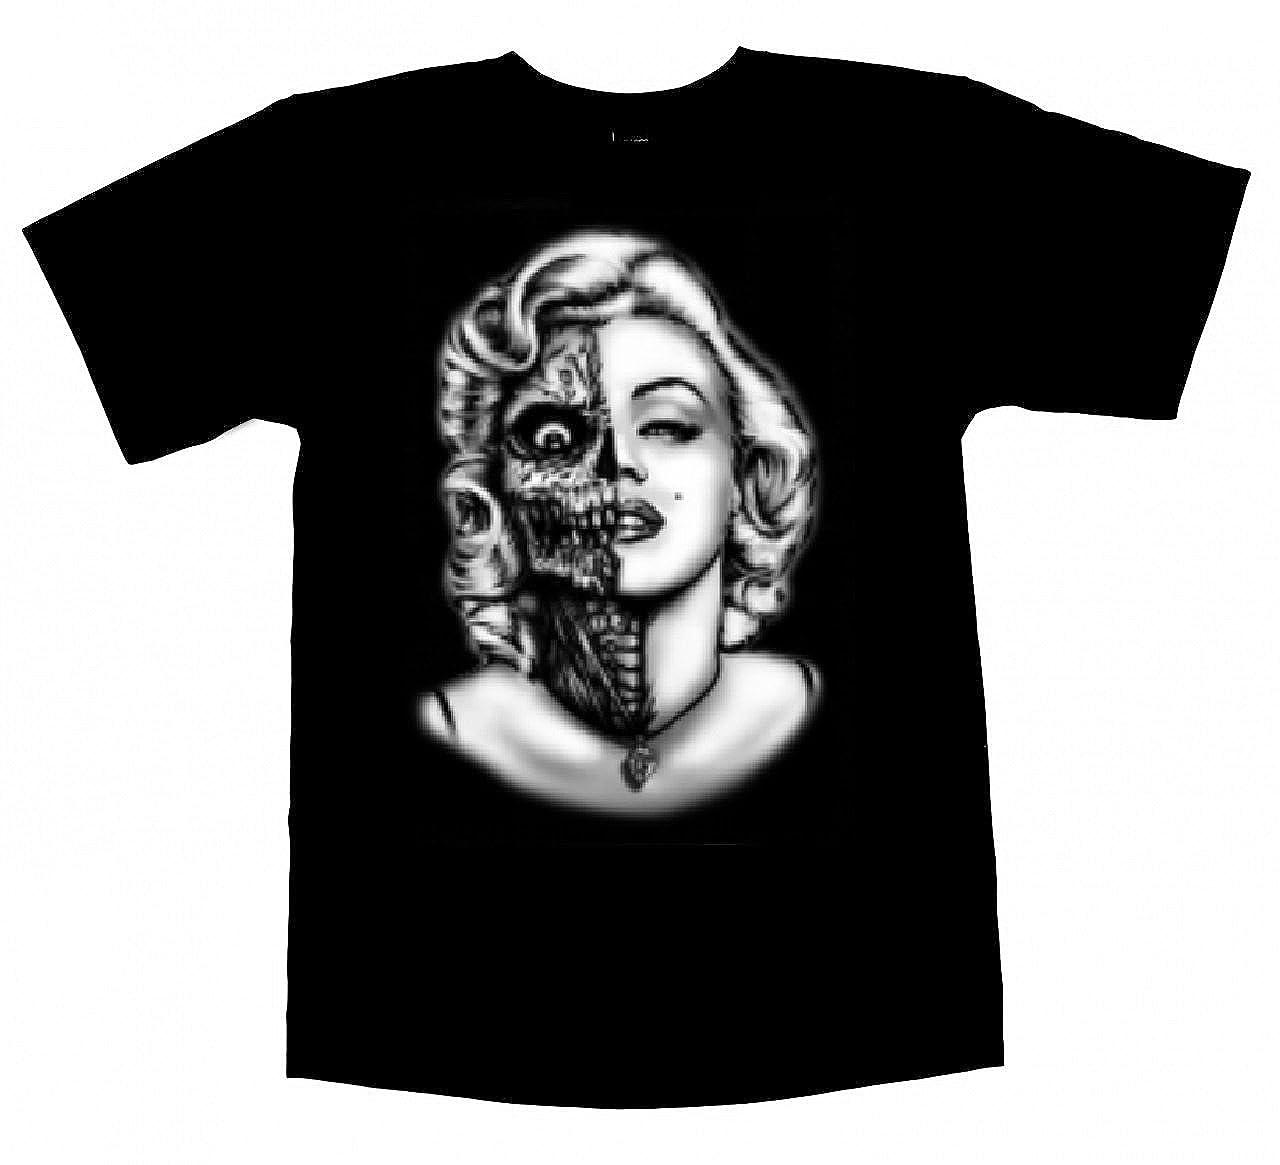 4d27c5d7d75 Top4  Marilyn Monroe Men s Shirt Sugar Skull Zombie Gangsta Black Shirt. Wholesale  Price 8.99 -  14.99. T-shirt